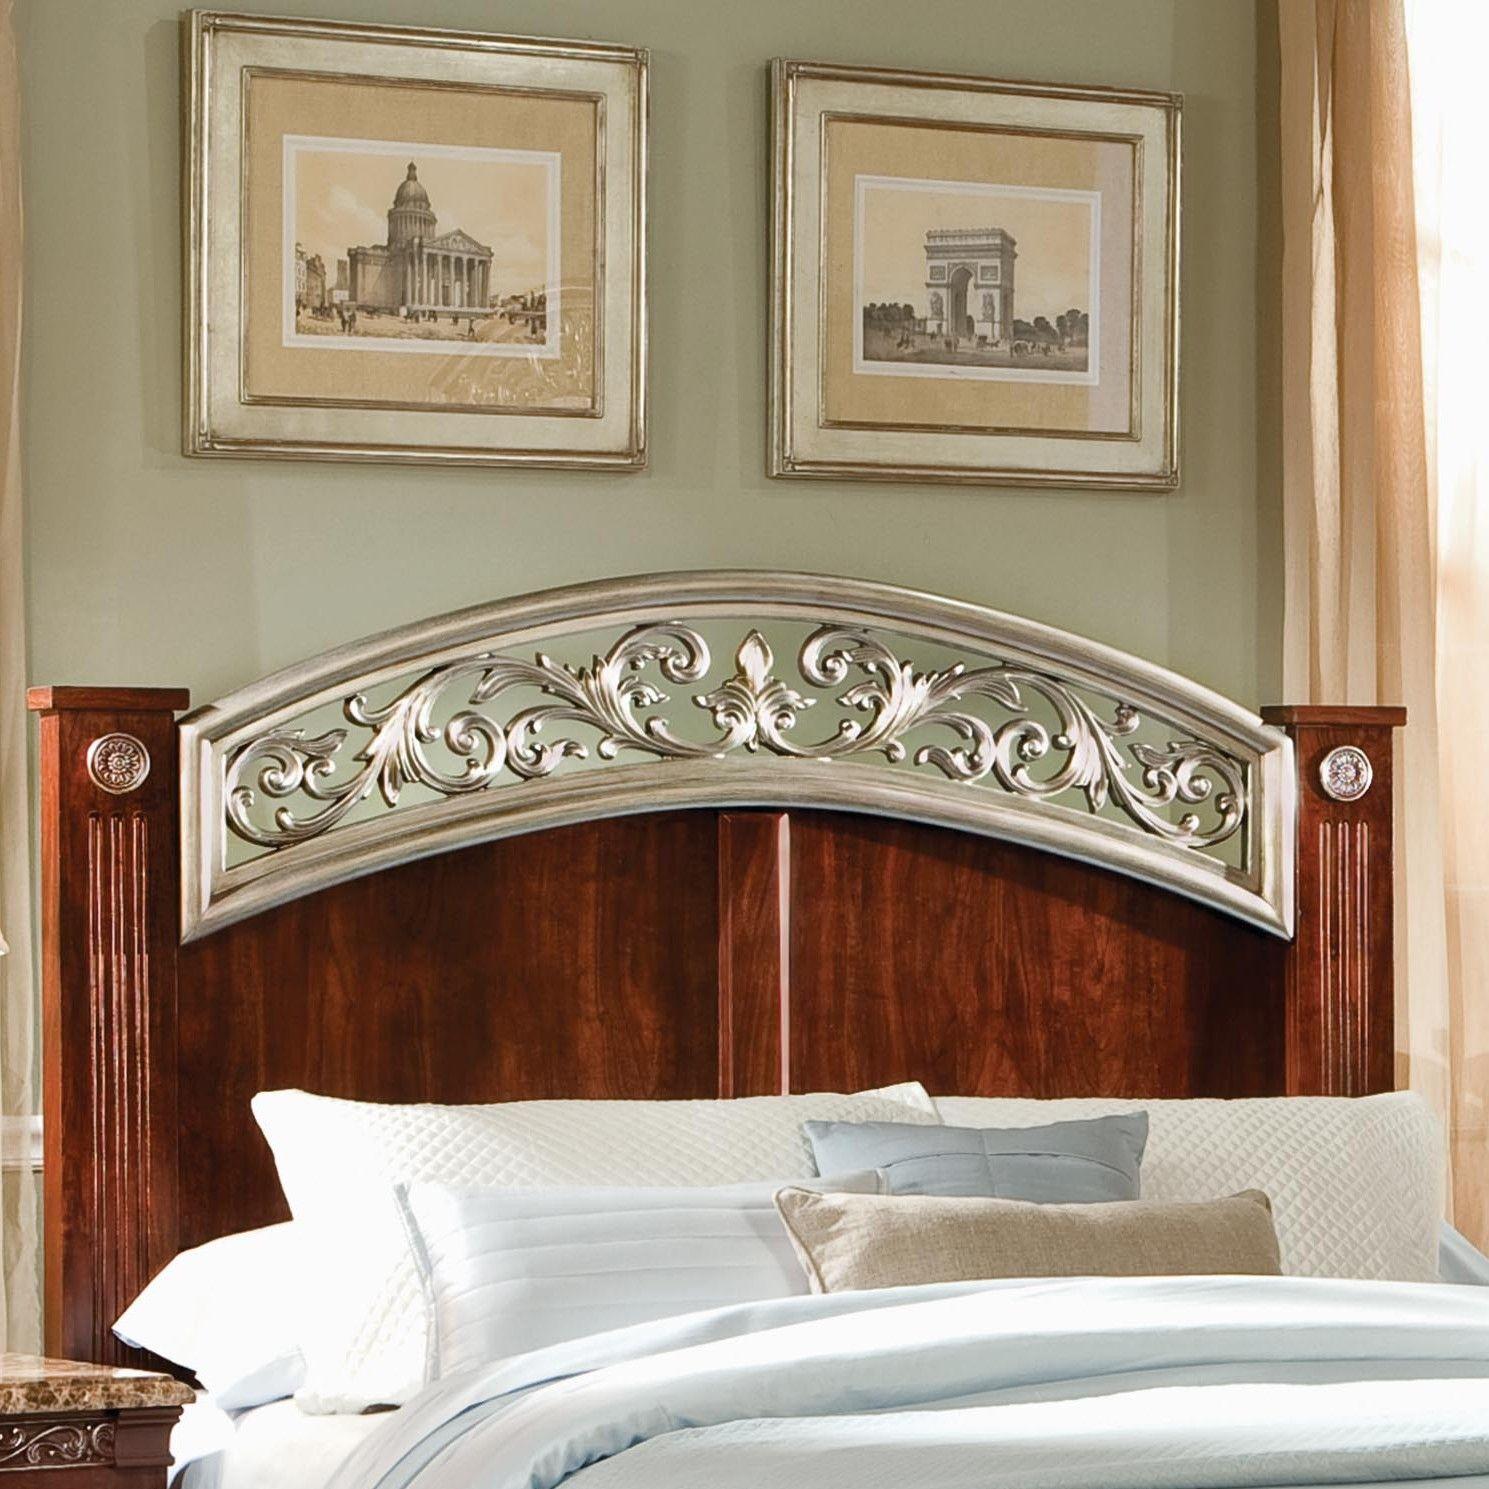 Standard Furniture Triomphe Panel Headboard Wayfair